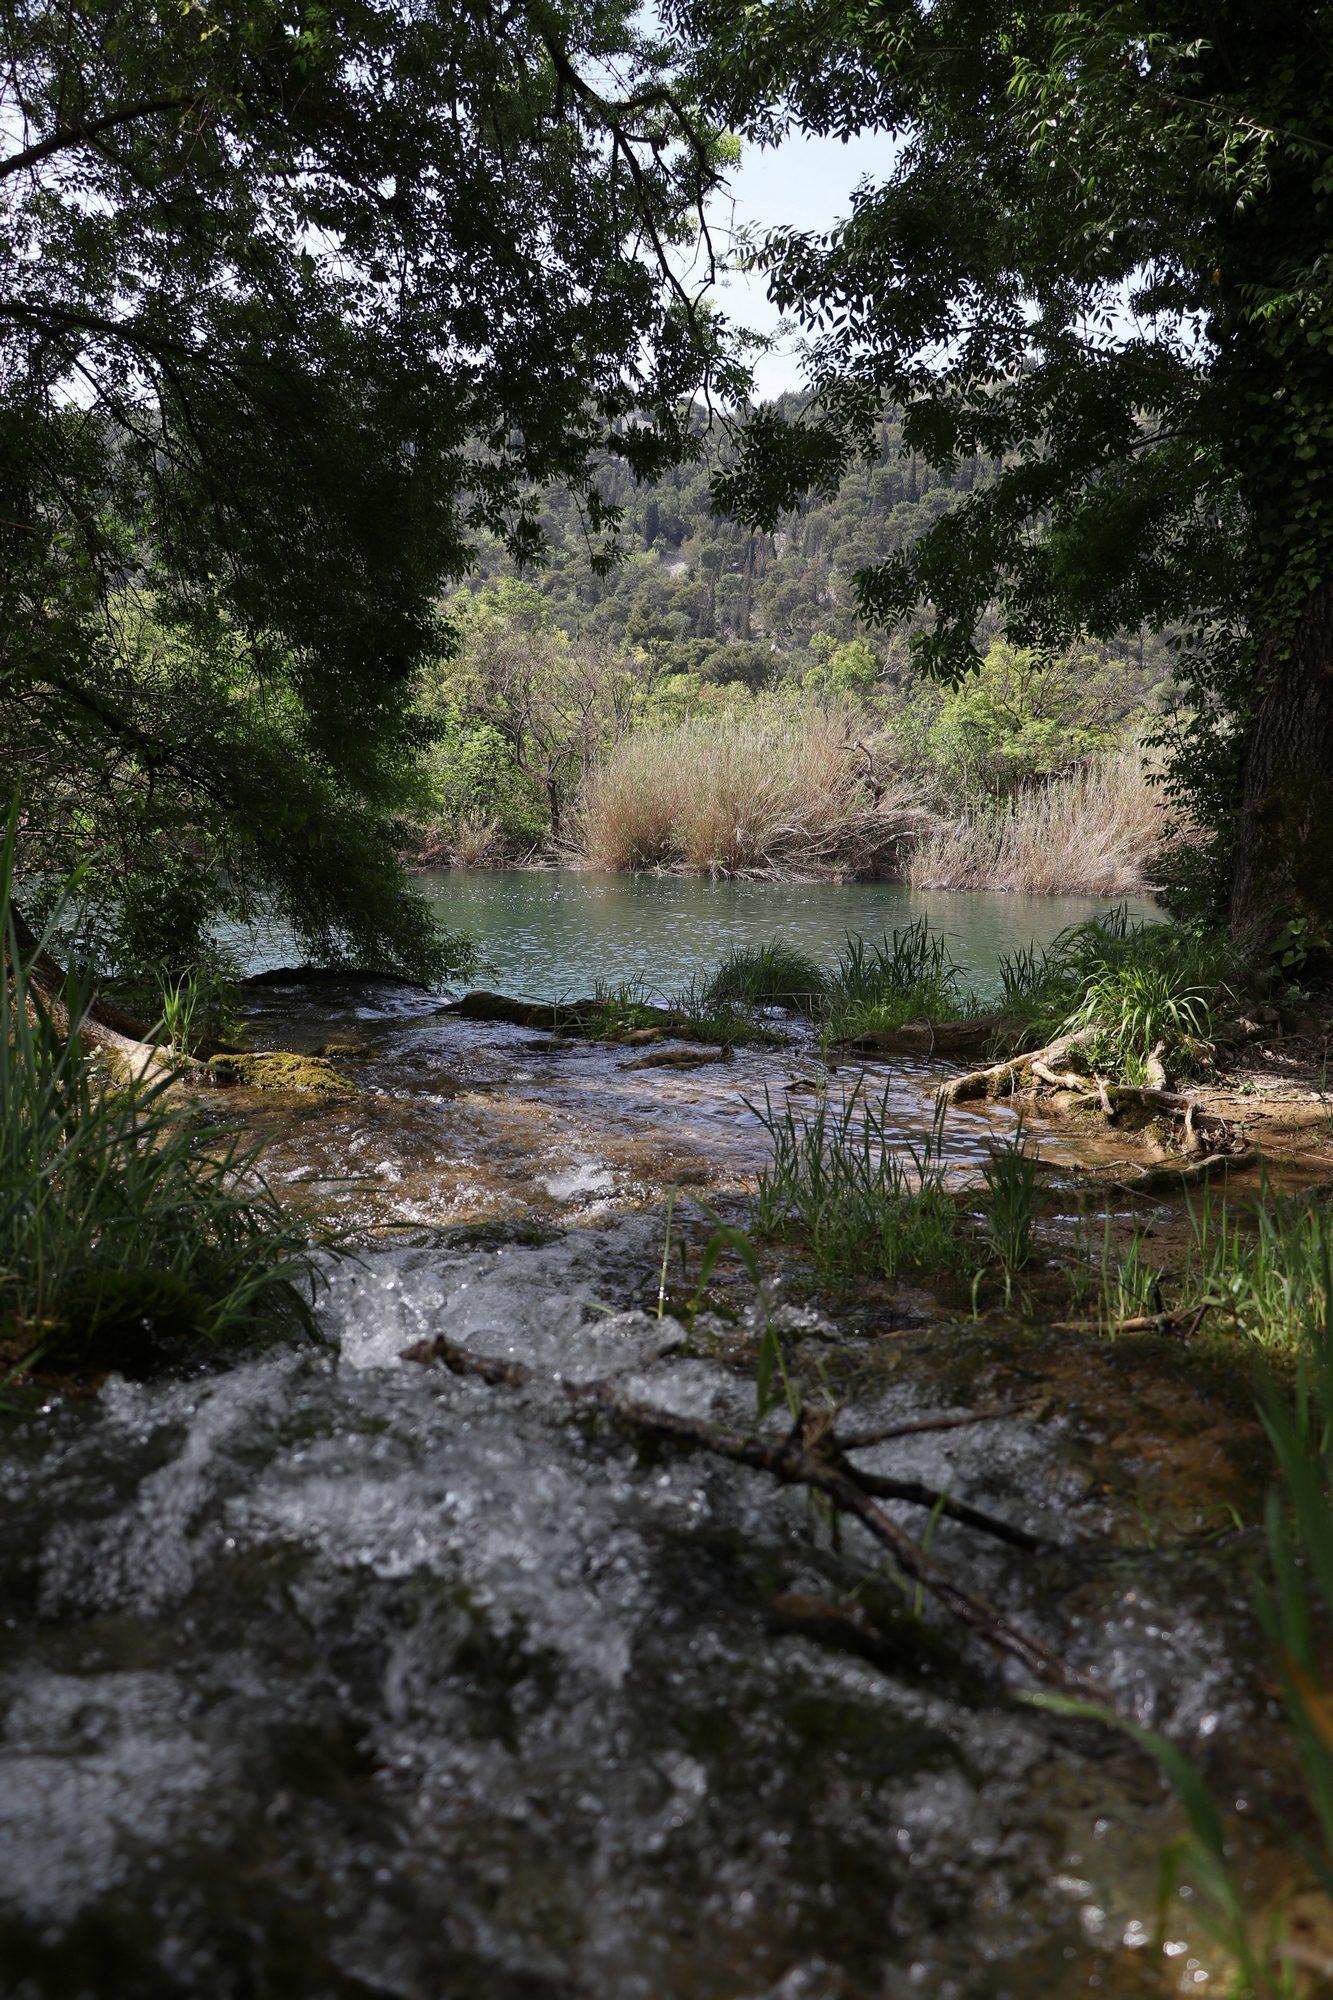 Landschaft im Krka-Nationalpark